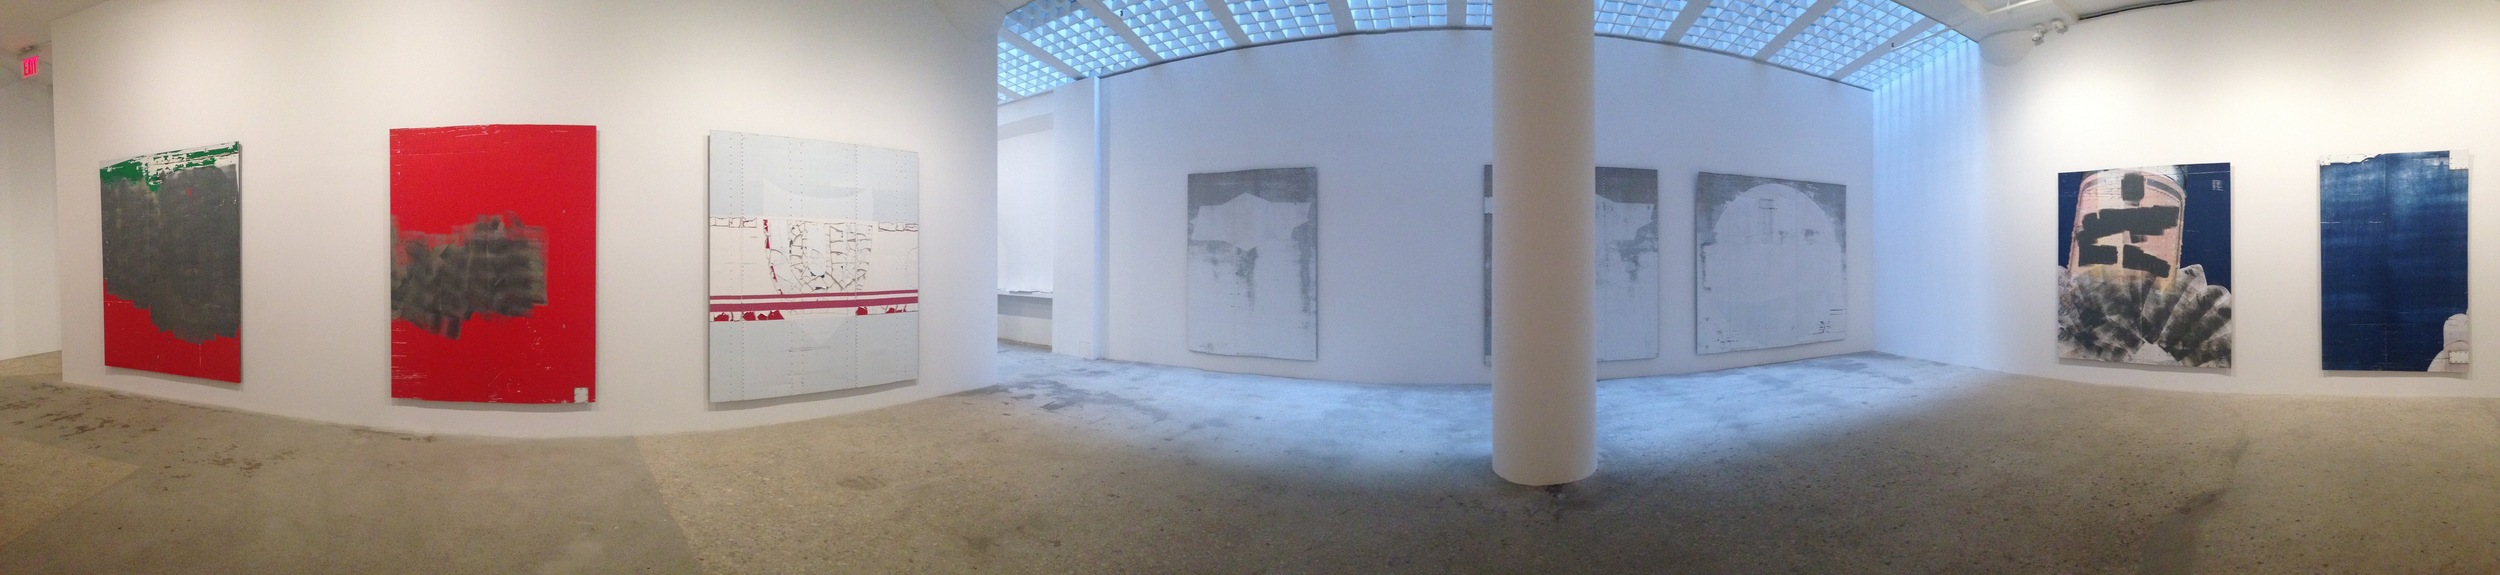 Exhibition Images, Gedi Sibony , Greene Naftali Gallery, New York. Photo Credits:Cincala Art Advisory